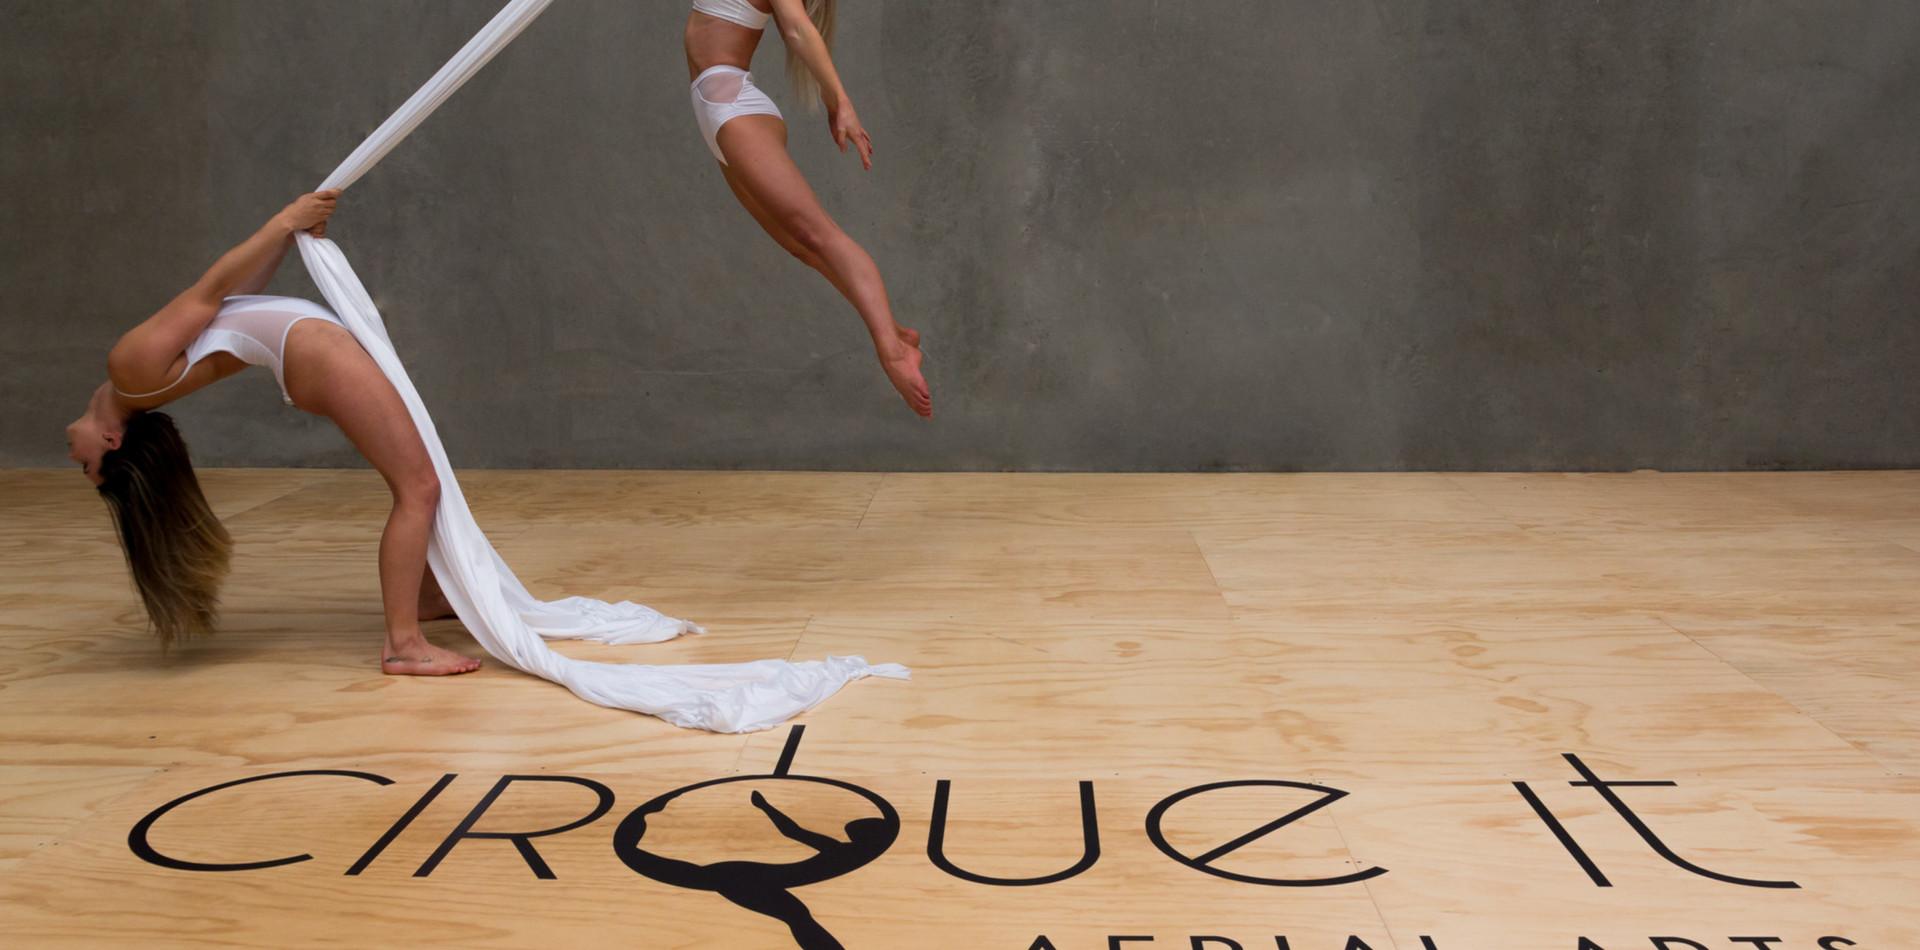 Cirque it - floor graphic